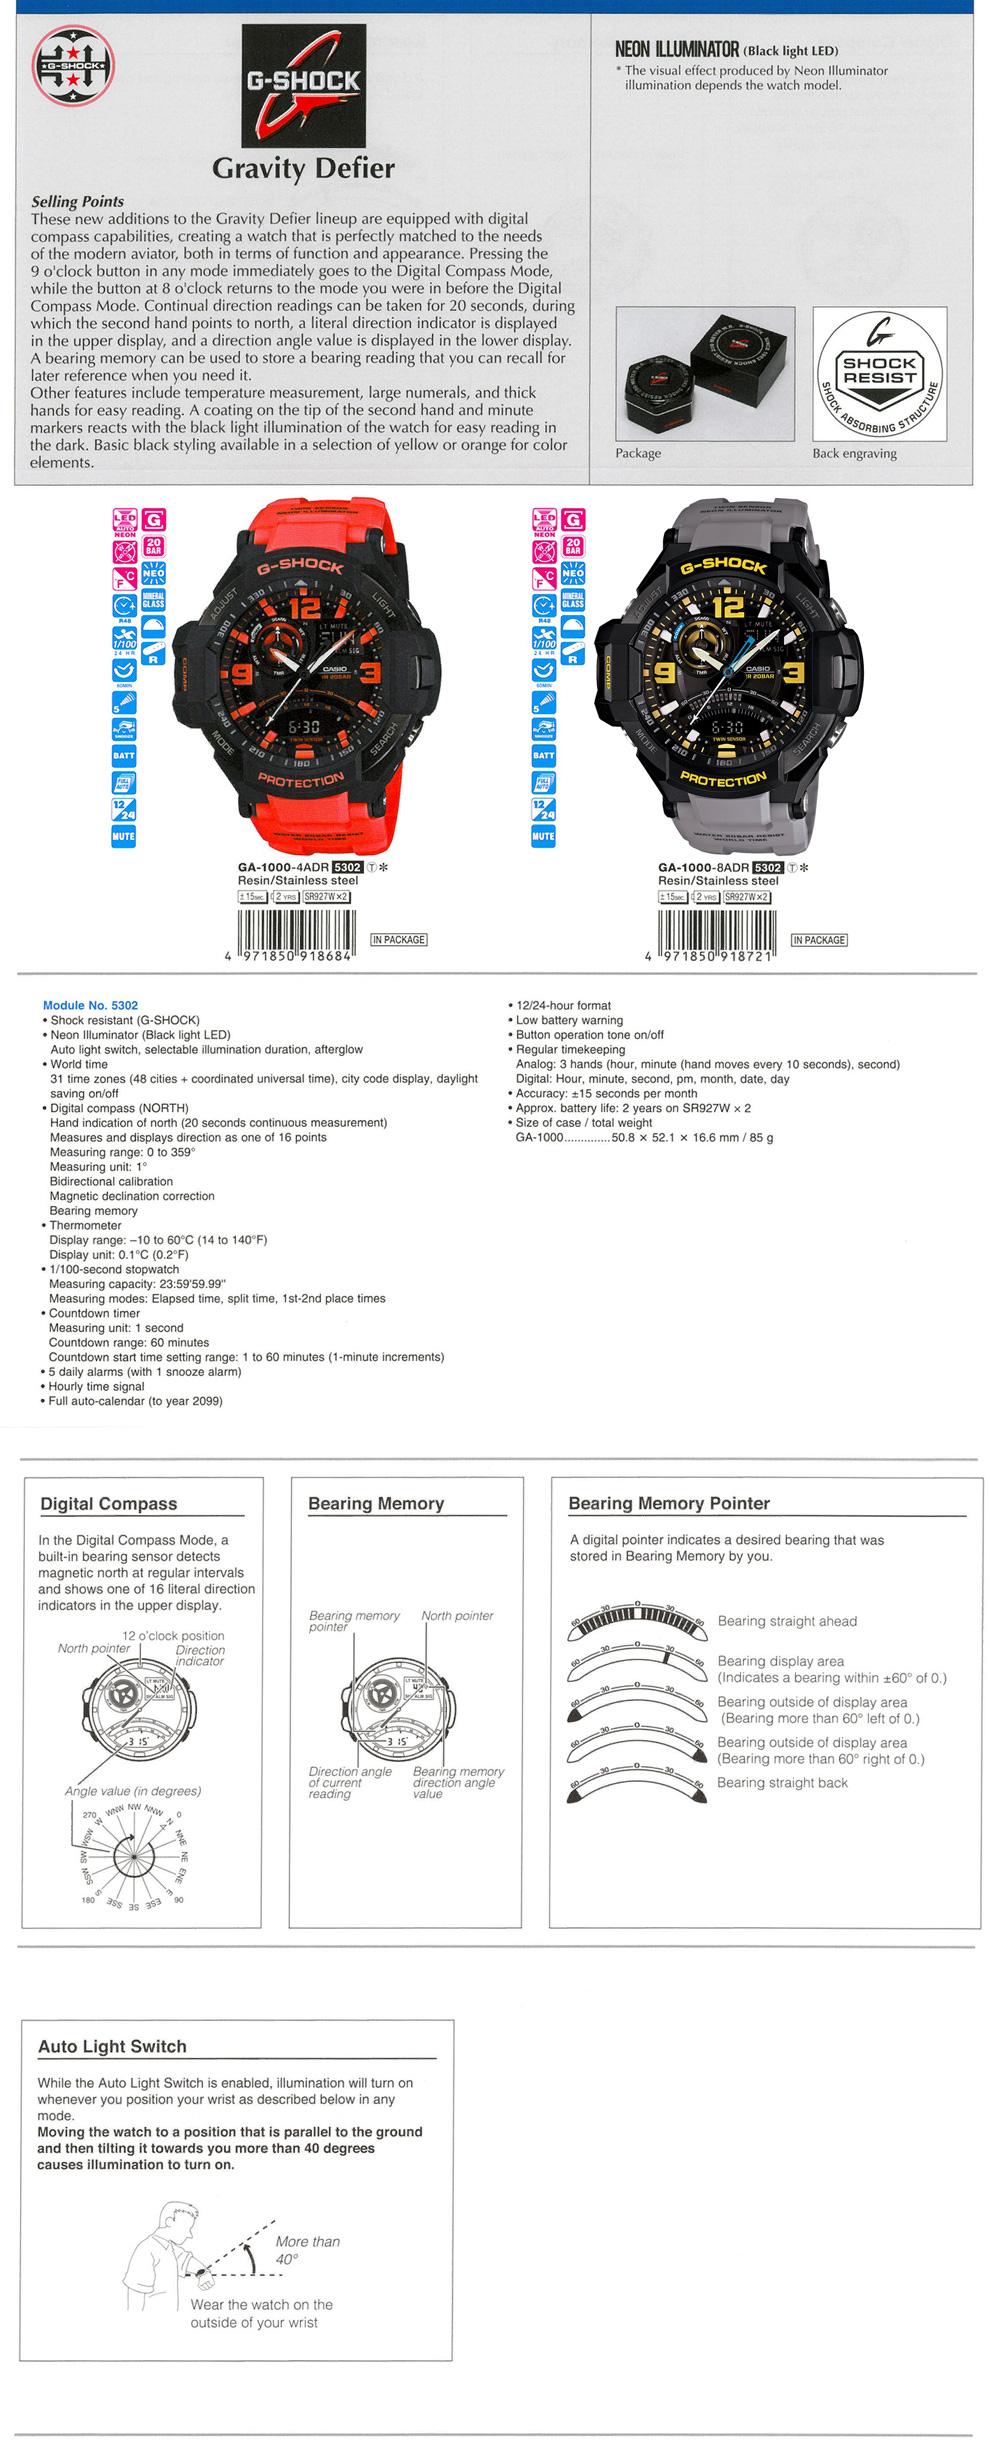 Npr G Shock Ga 1000 Casio 8adr Gravity Defier Neon Illuminator Compass Bearing